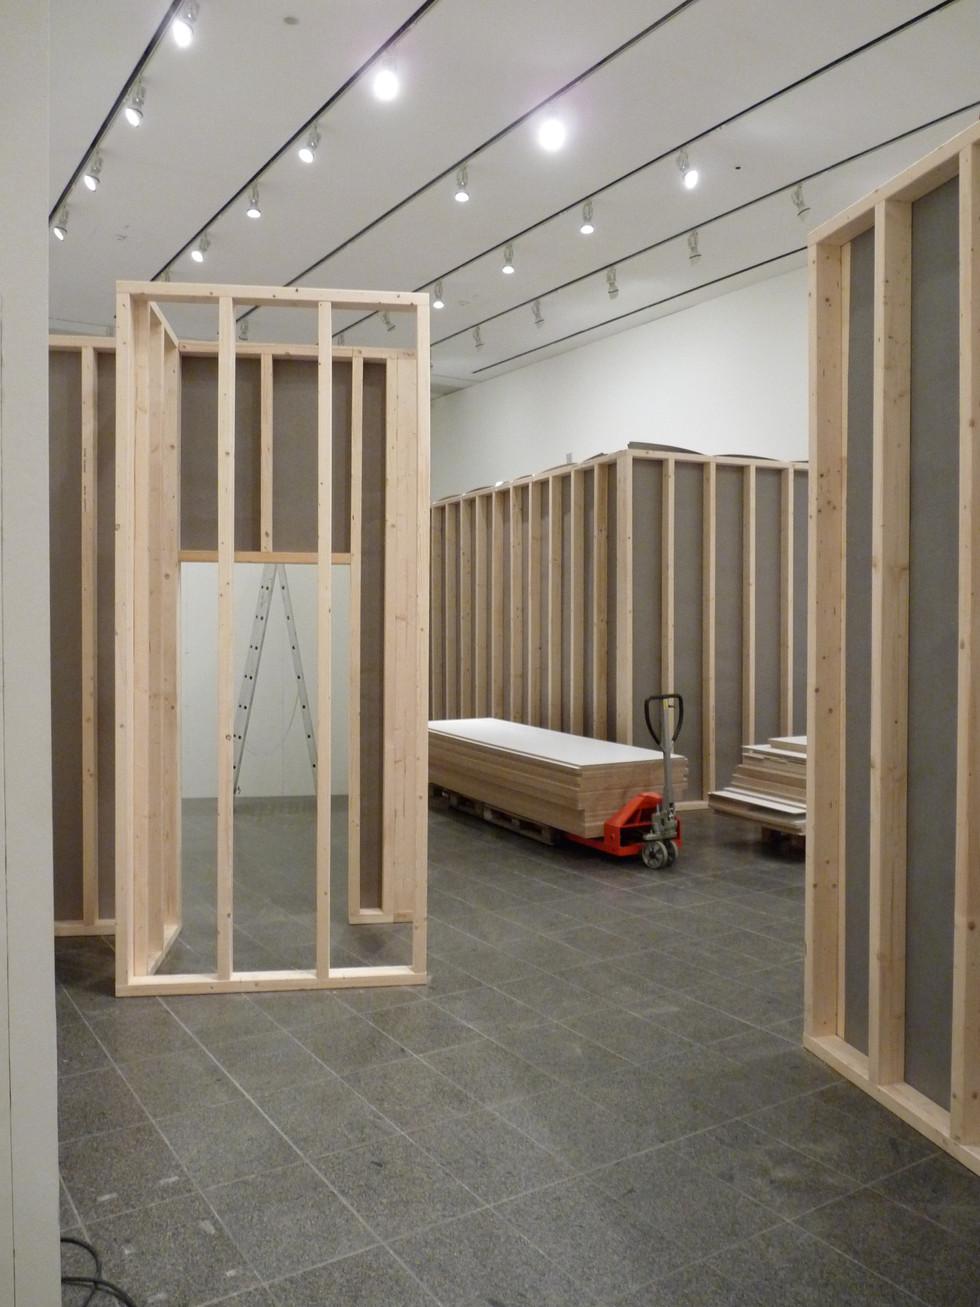 Gillian Wearing, Kunstsammlung Nordrhein Westfalen, K20 © Thomas Stadler